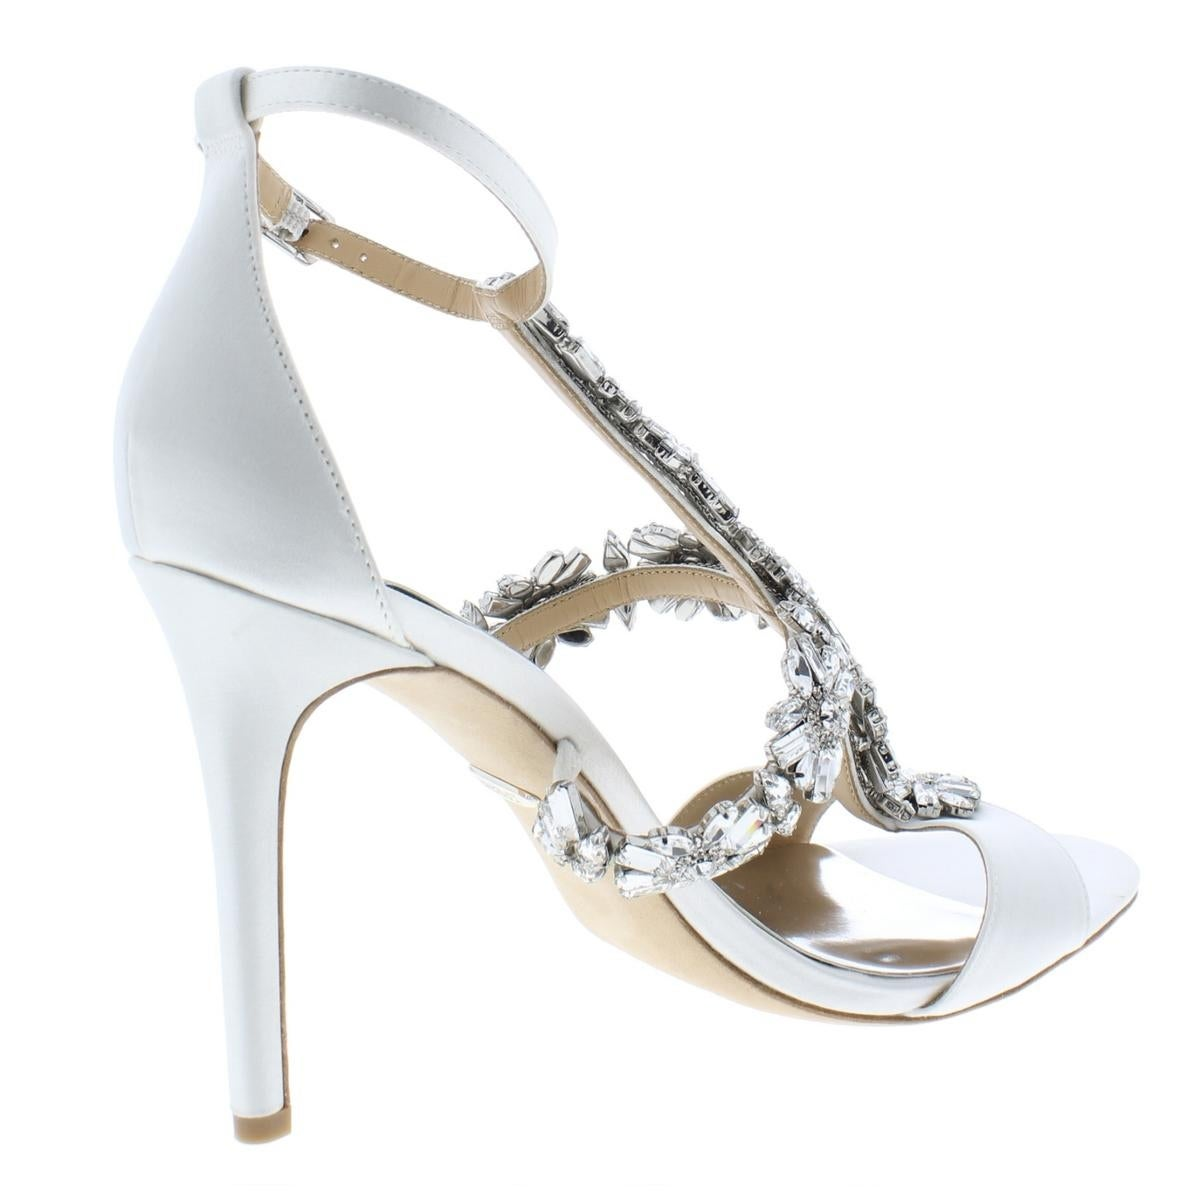 7cbe265c42a Shop Badgley Mischka Womens Munroe Evening Sandals Satin Heels - 7.5 Medium  (B